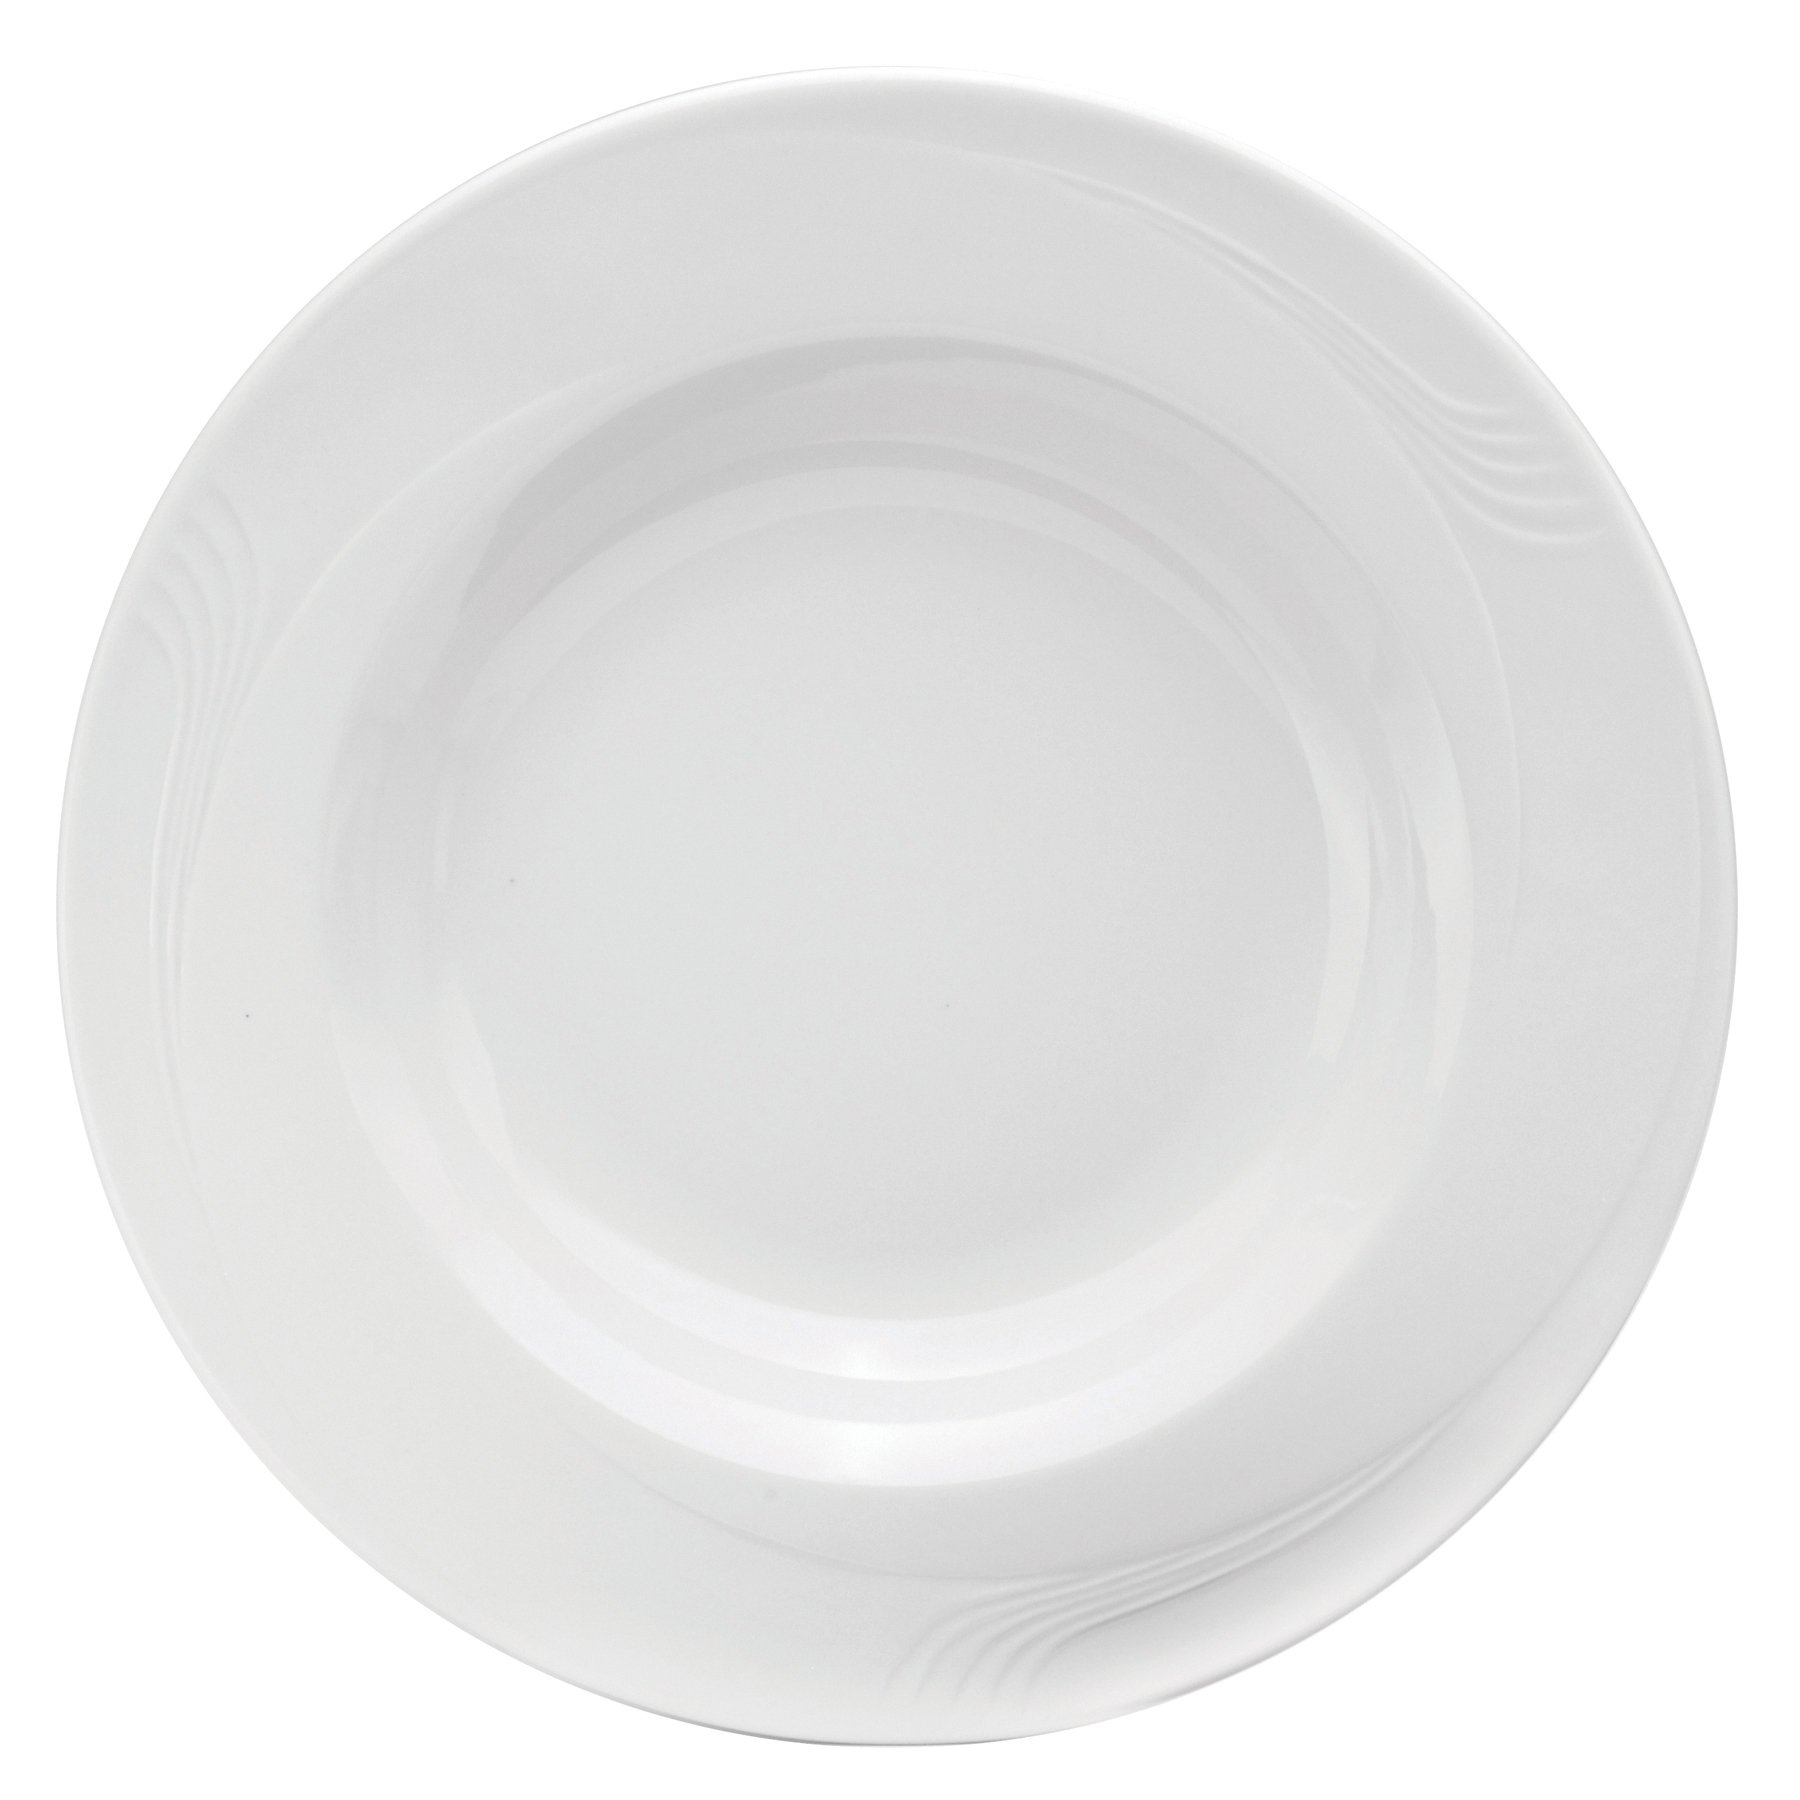 Oneida Foodservice F1040000790 Espree Pasta Bowls, 11'', Cream White Porcelain, Set of 12